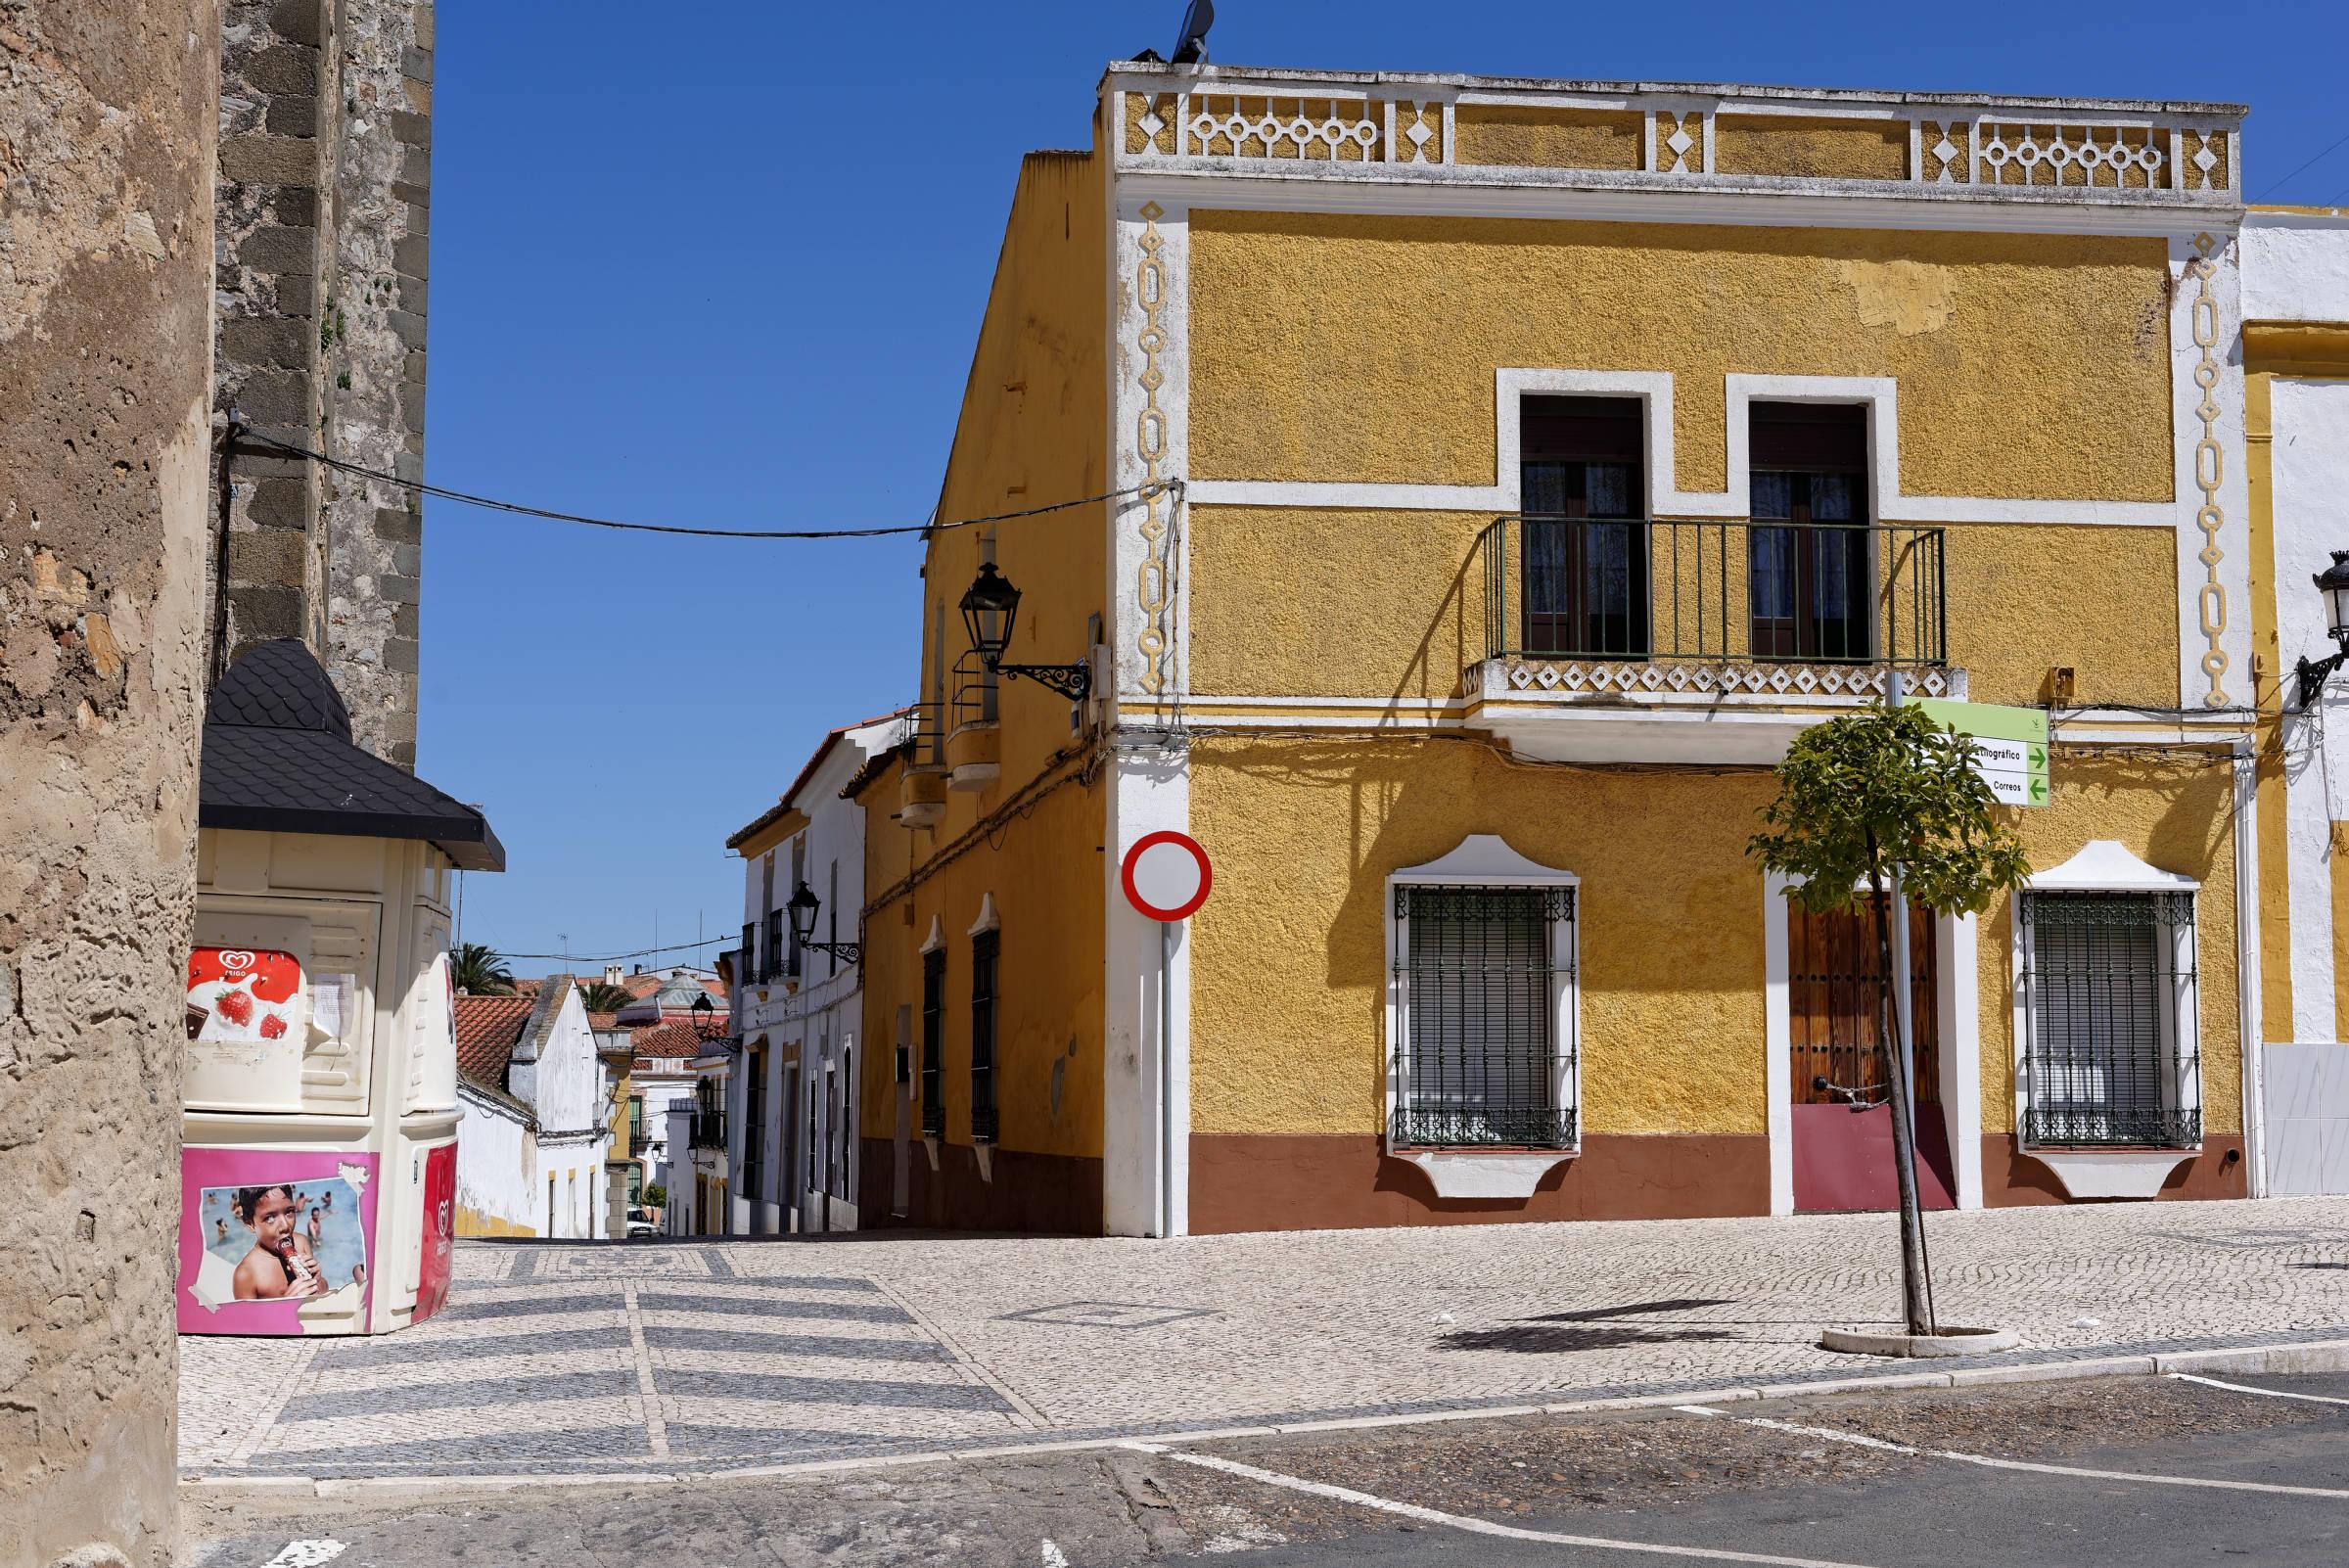 160407-La Albuera (Estremadure) (12)